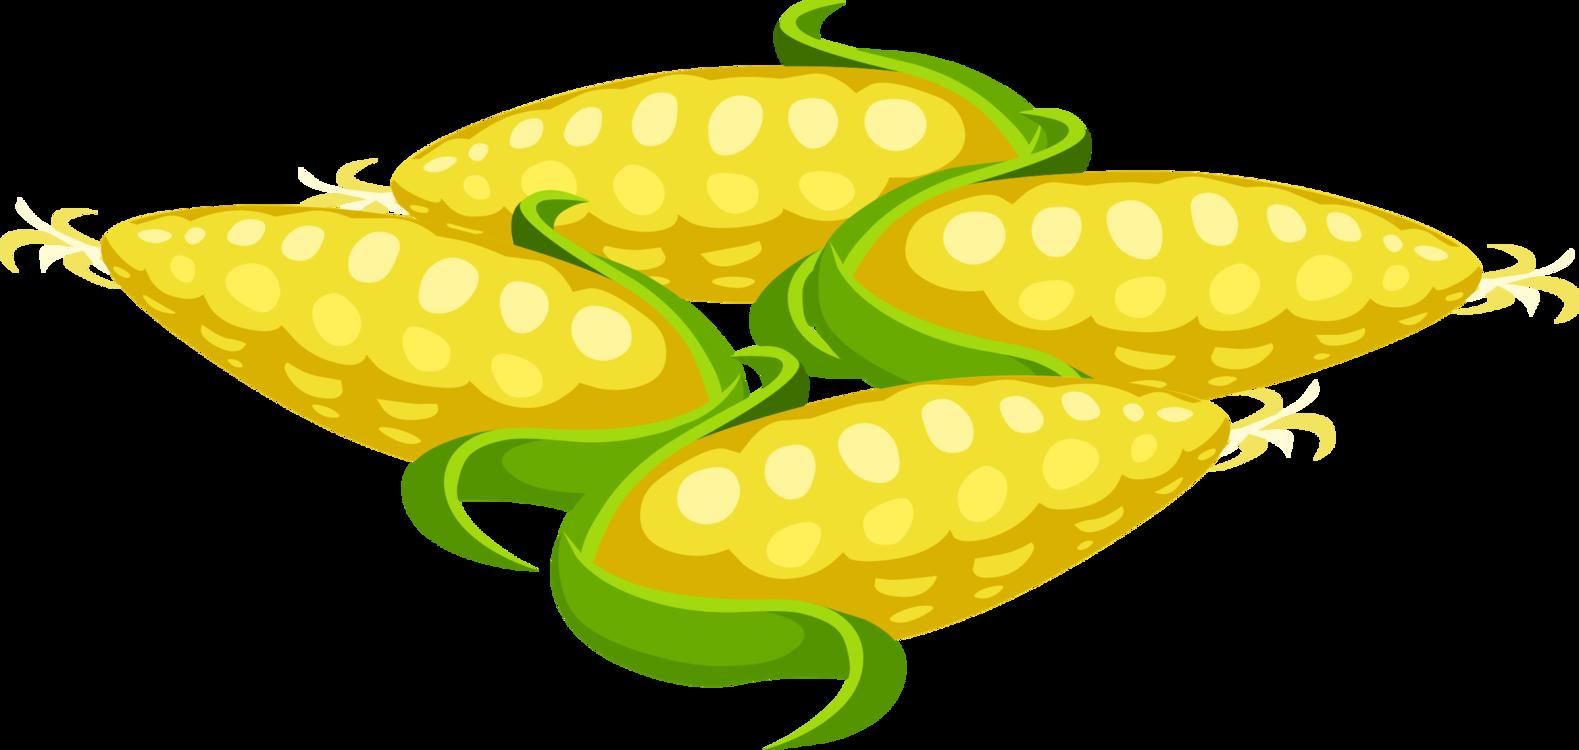 Vegetarian Food,Commodity,Food